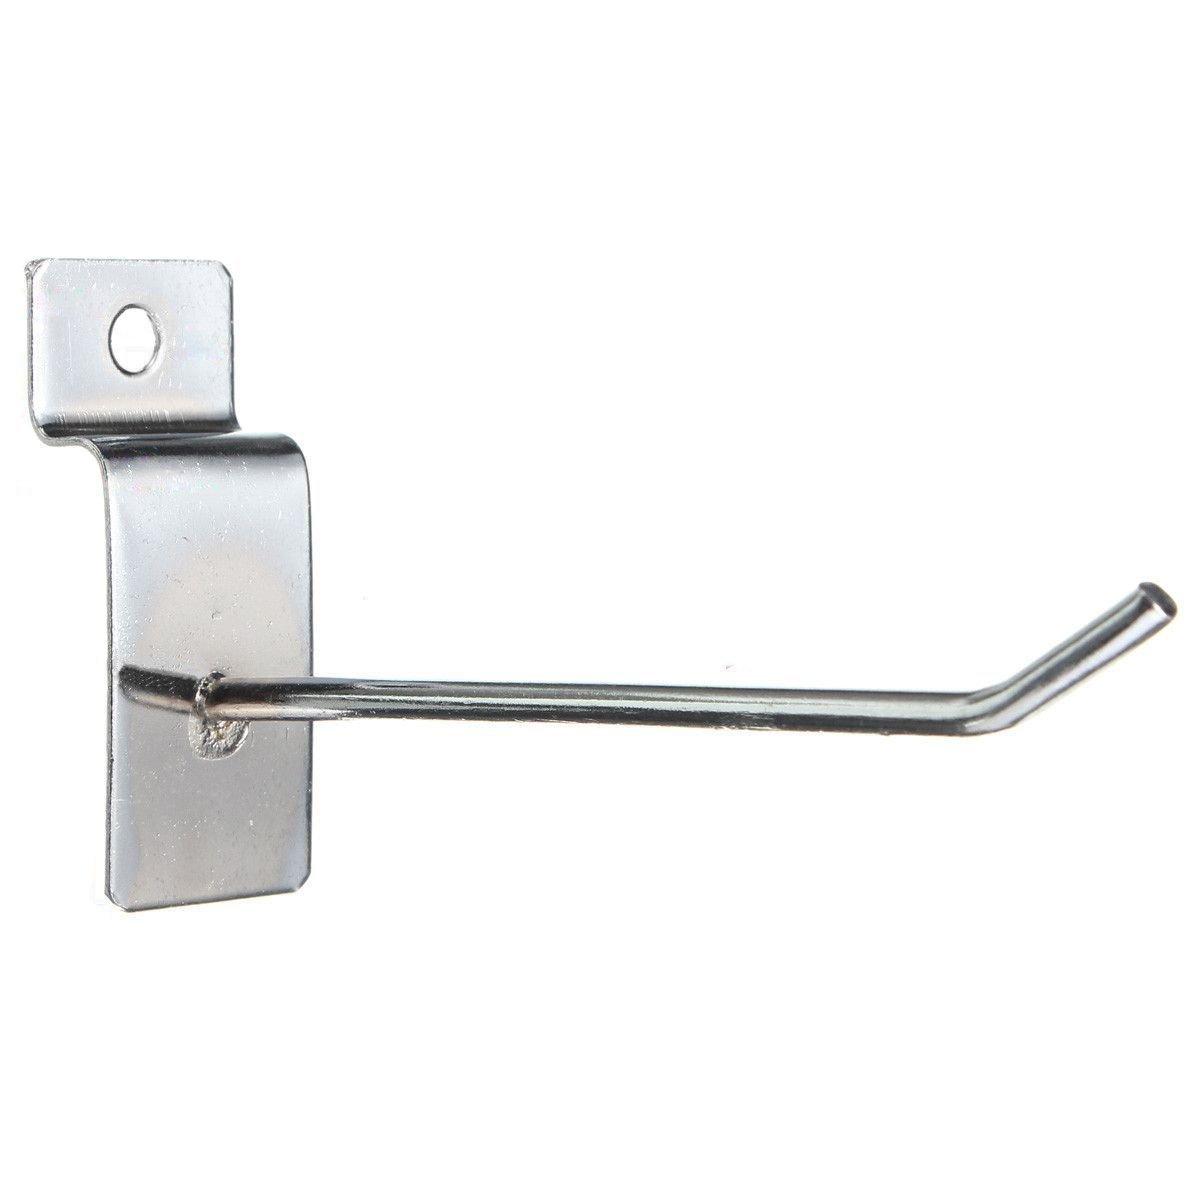 Single pegboard hooks - SODIAL(R) 25 x Slatwall Single Hook Pin Shop Display Fitting Prong Hanger 100mm SPHAGT49816